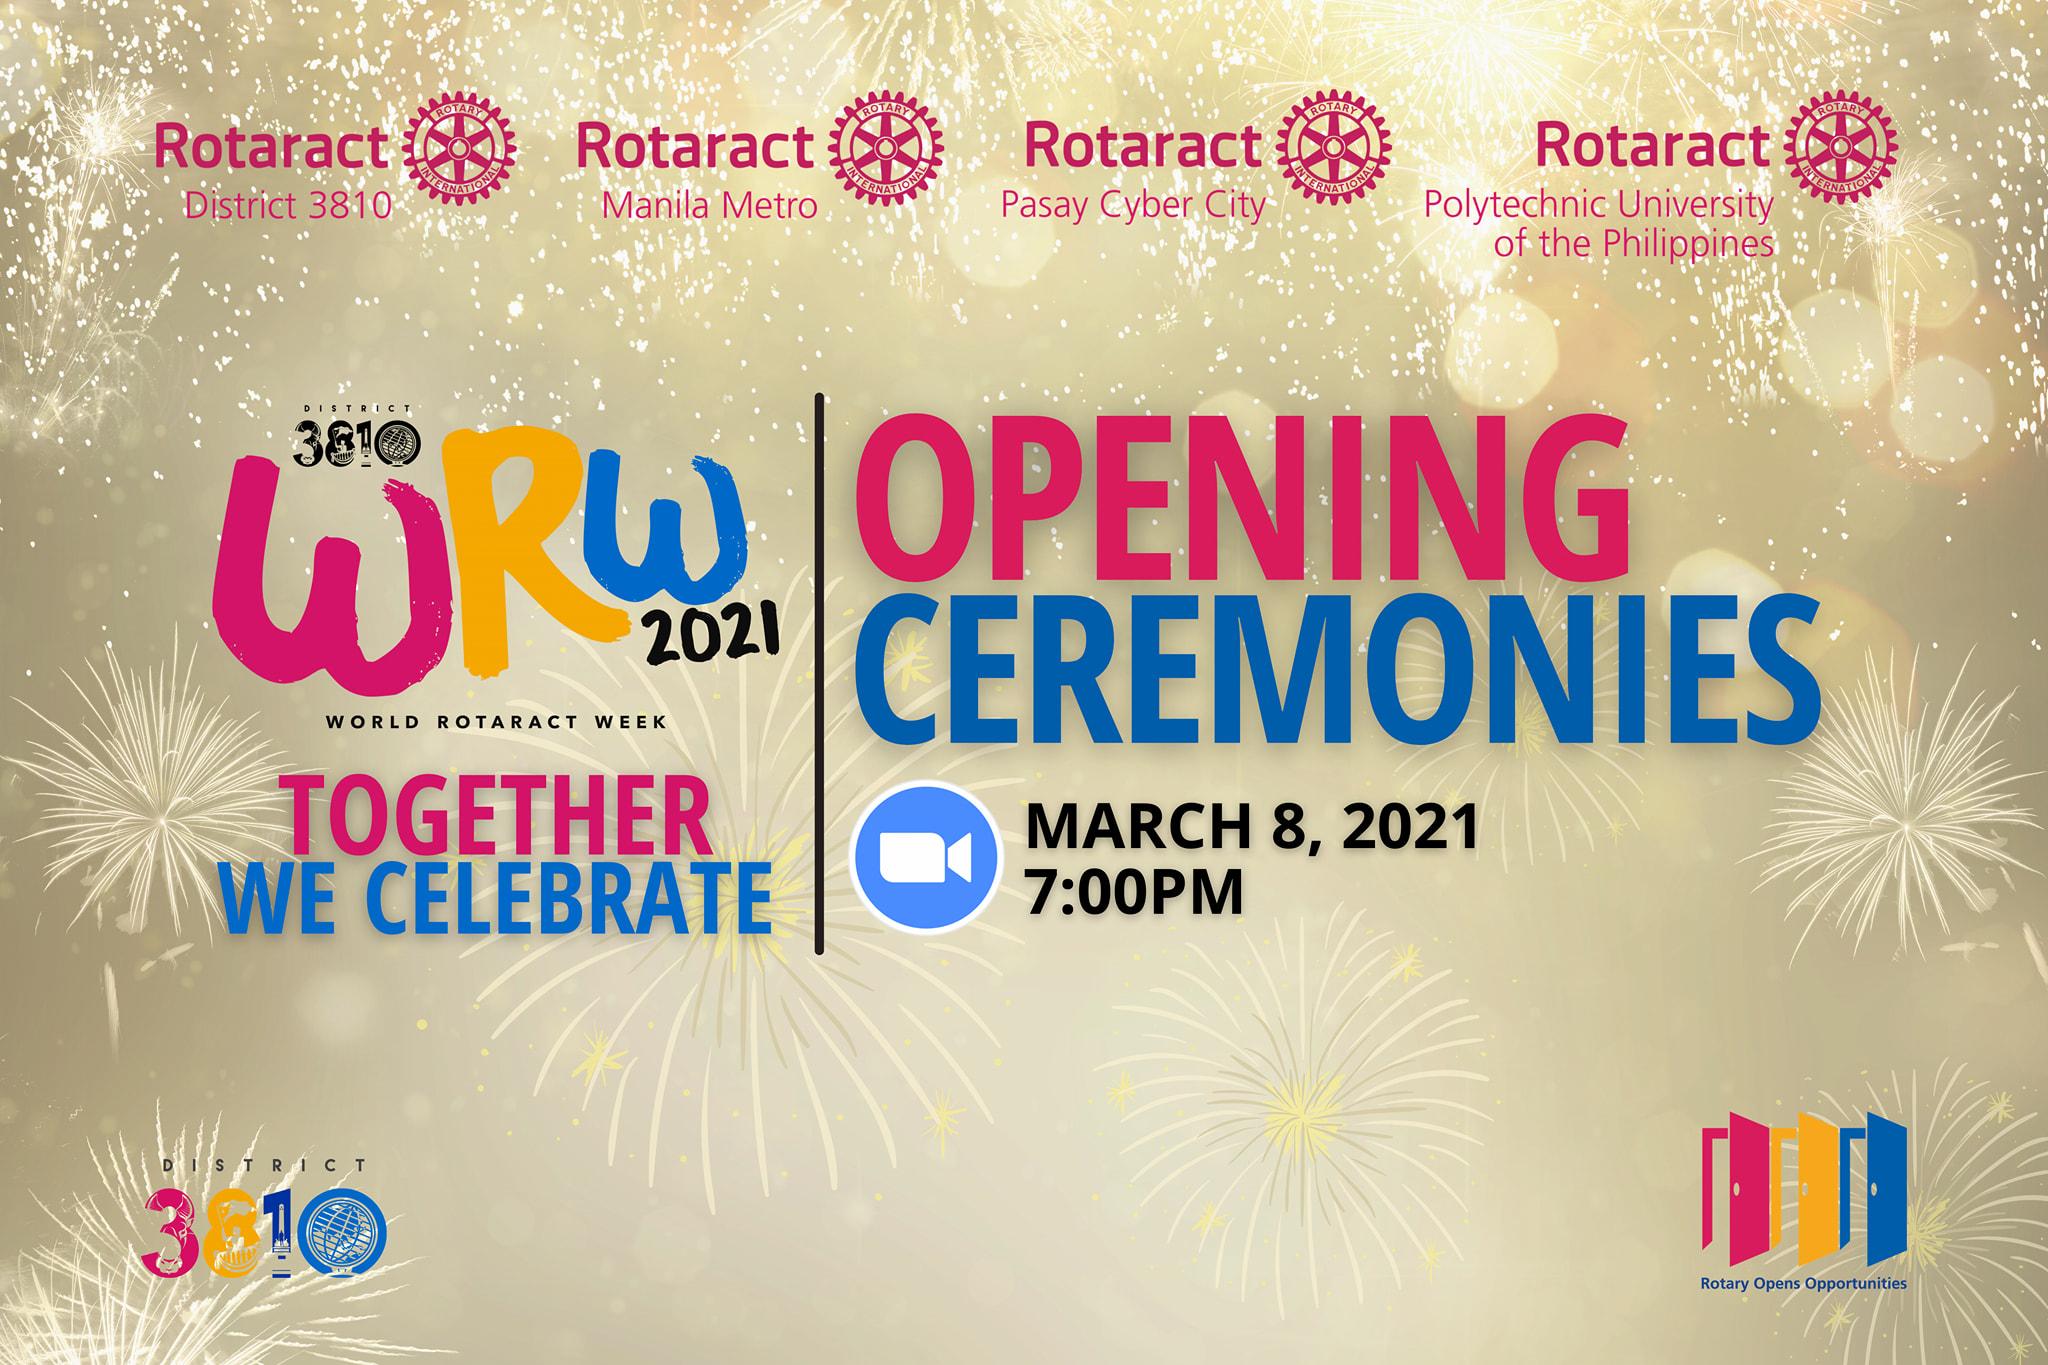 District 3810 World Rotaract Week Kick-Off